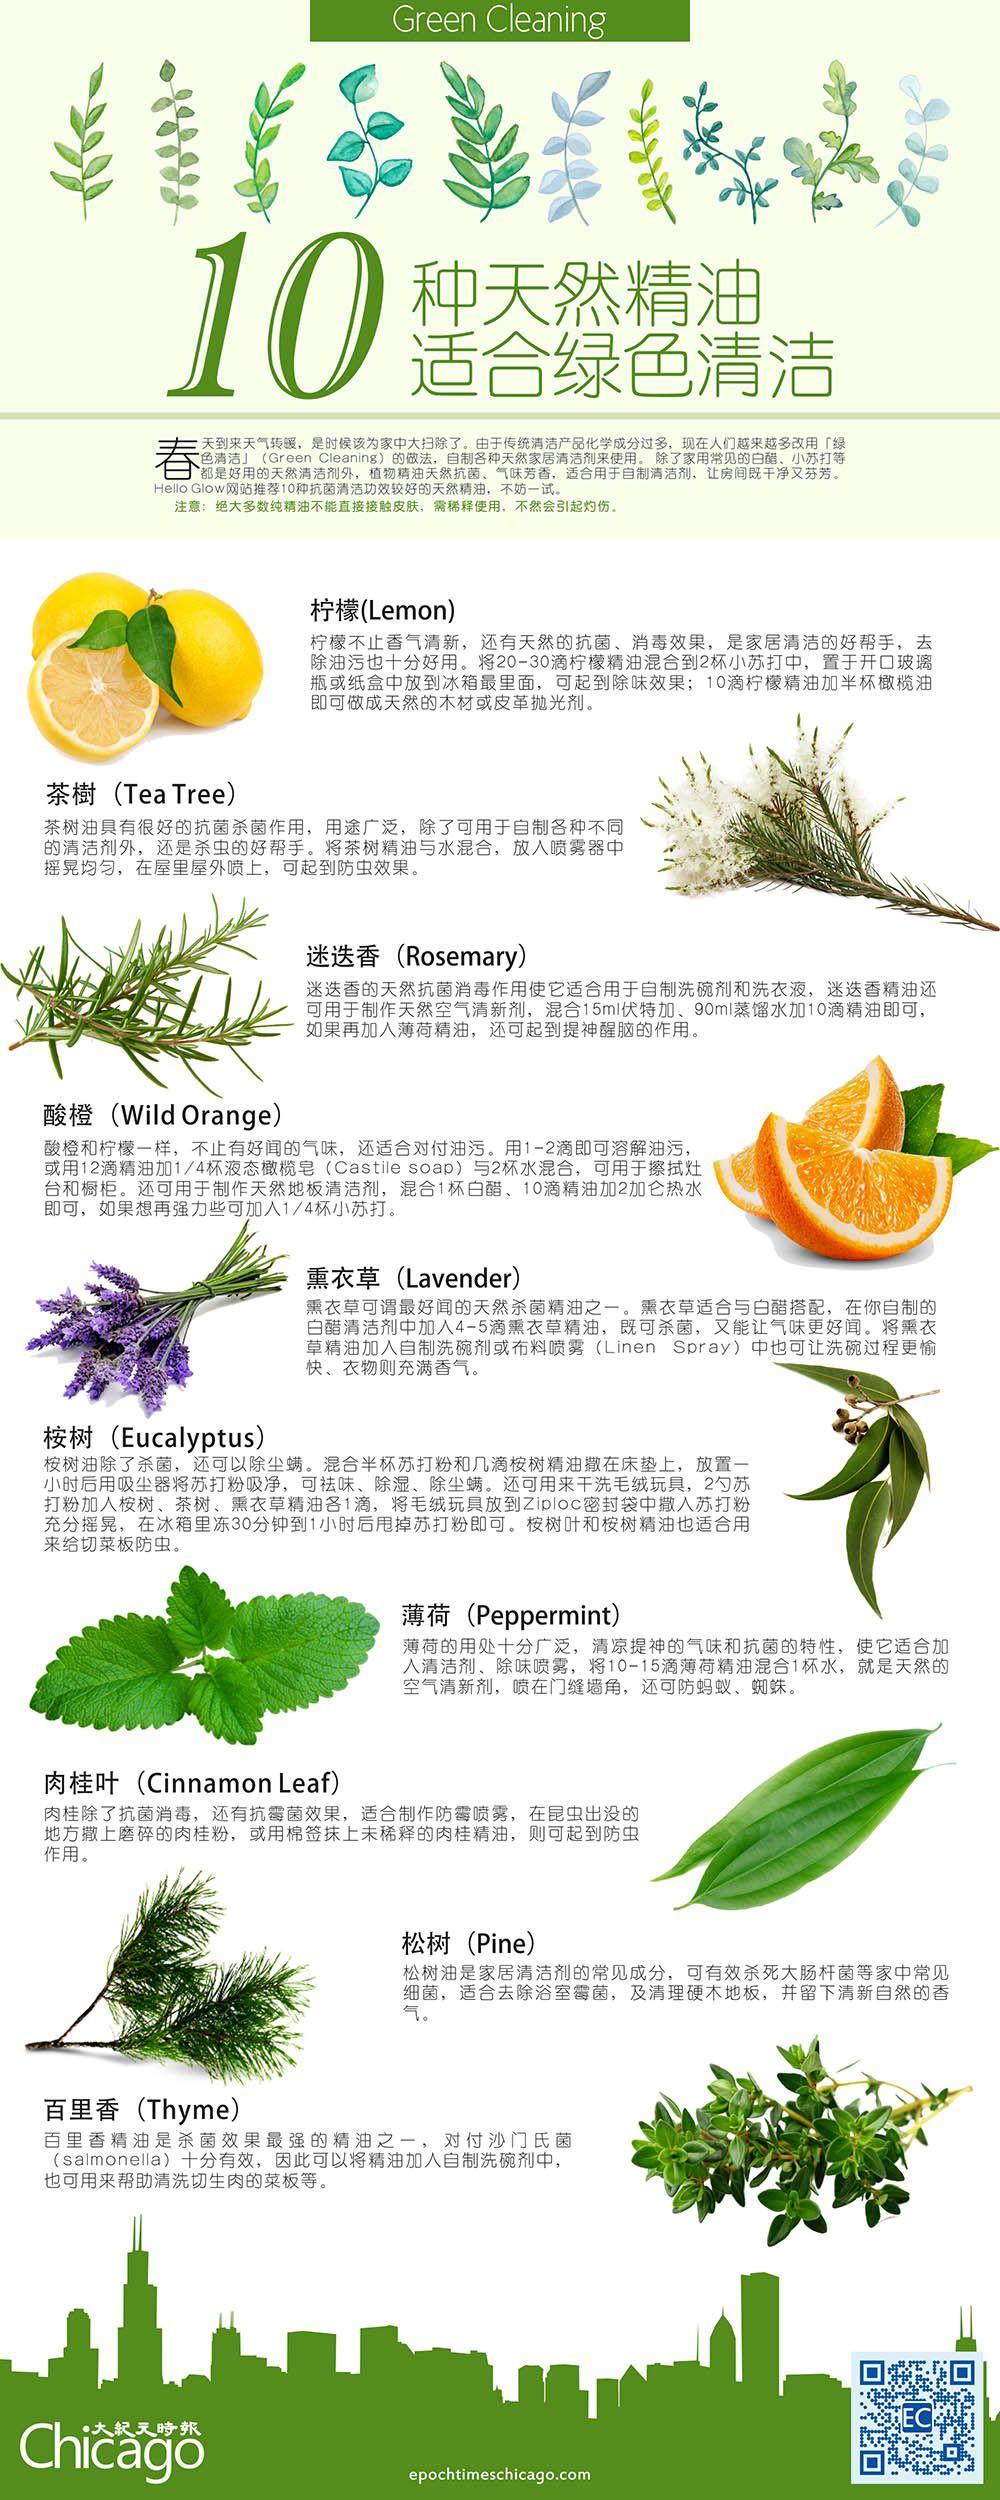 10种天然精油 适合绿色清洁 Green Cleaning Lemon Tea Tea Tree